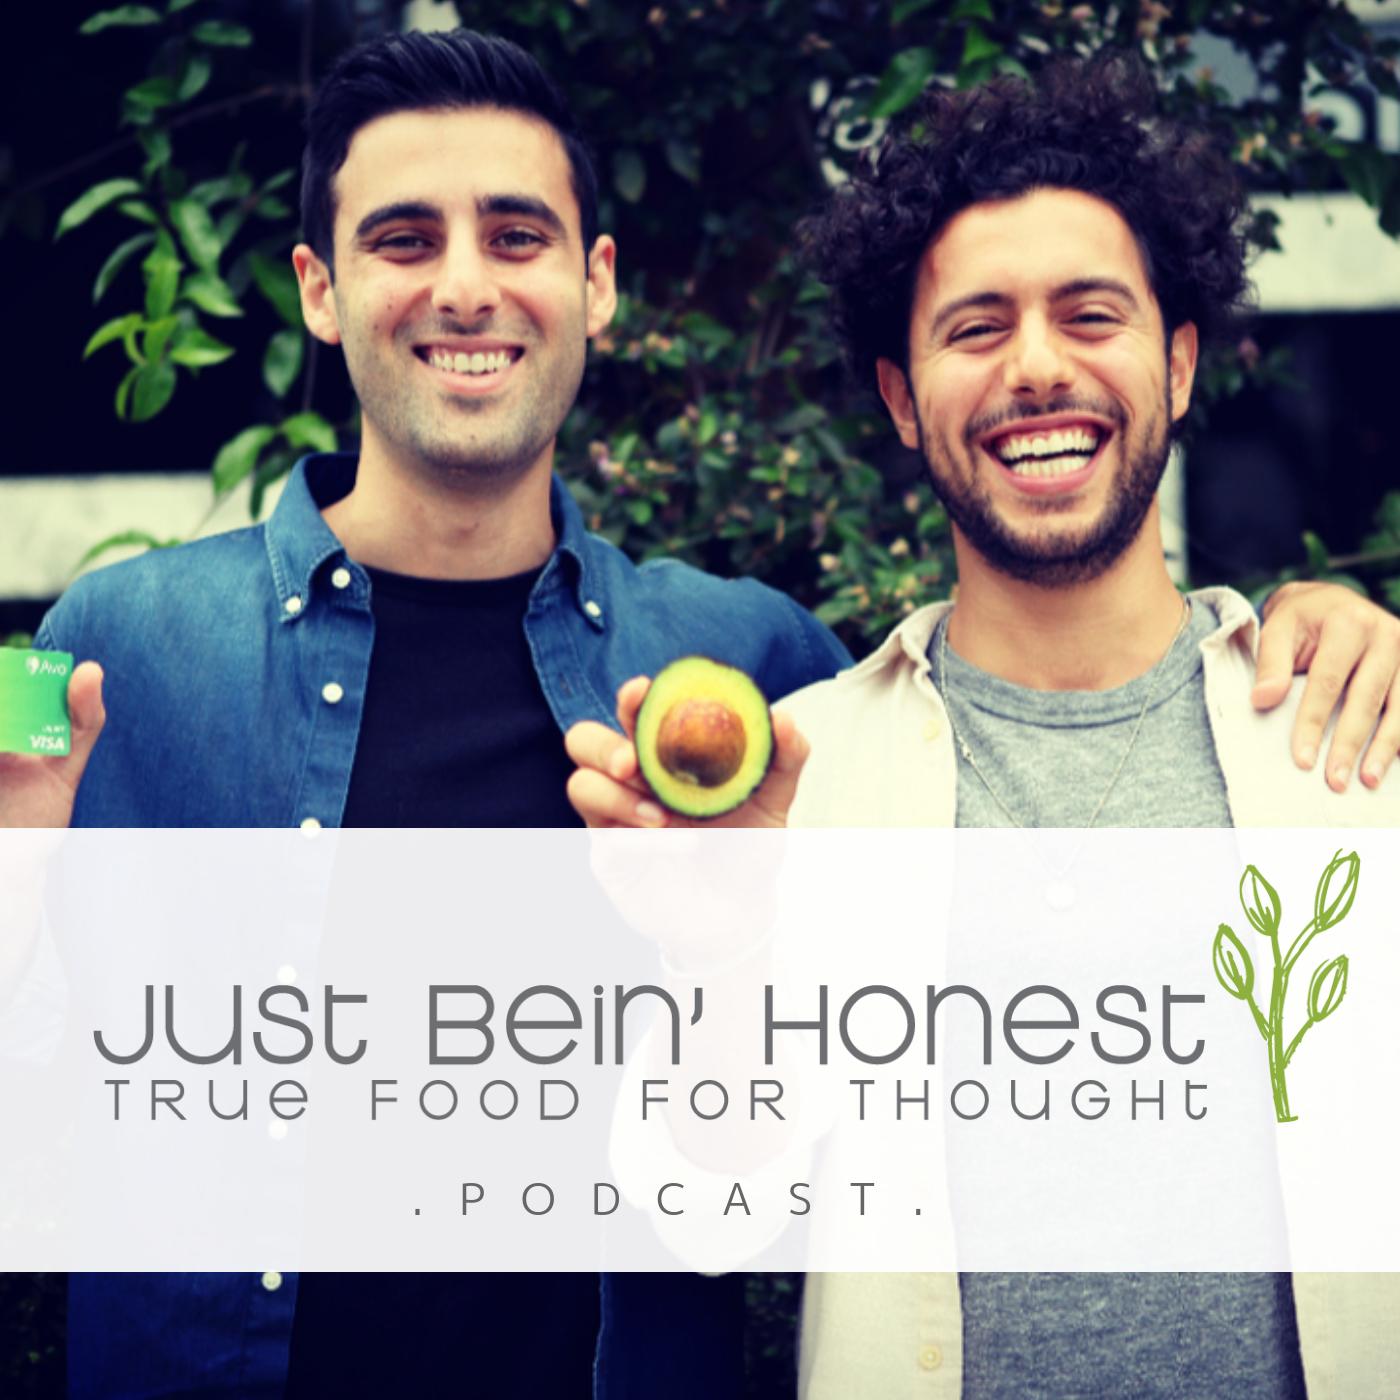 JON SHOOSHANI Ep 42 _ Just Bein' Honest - PODCAST